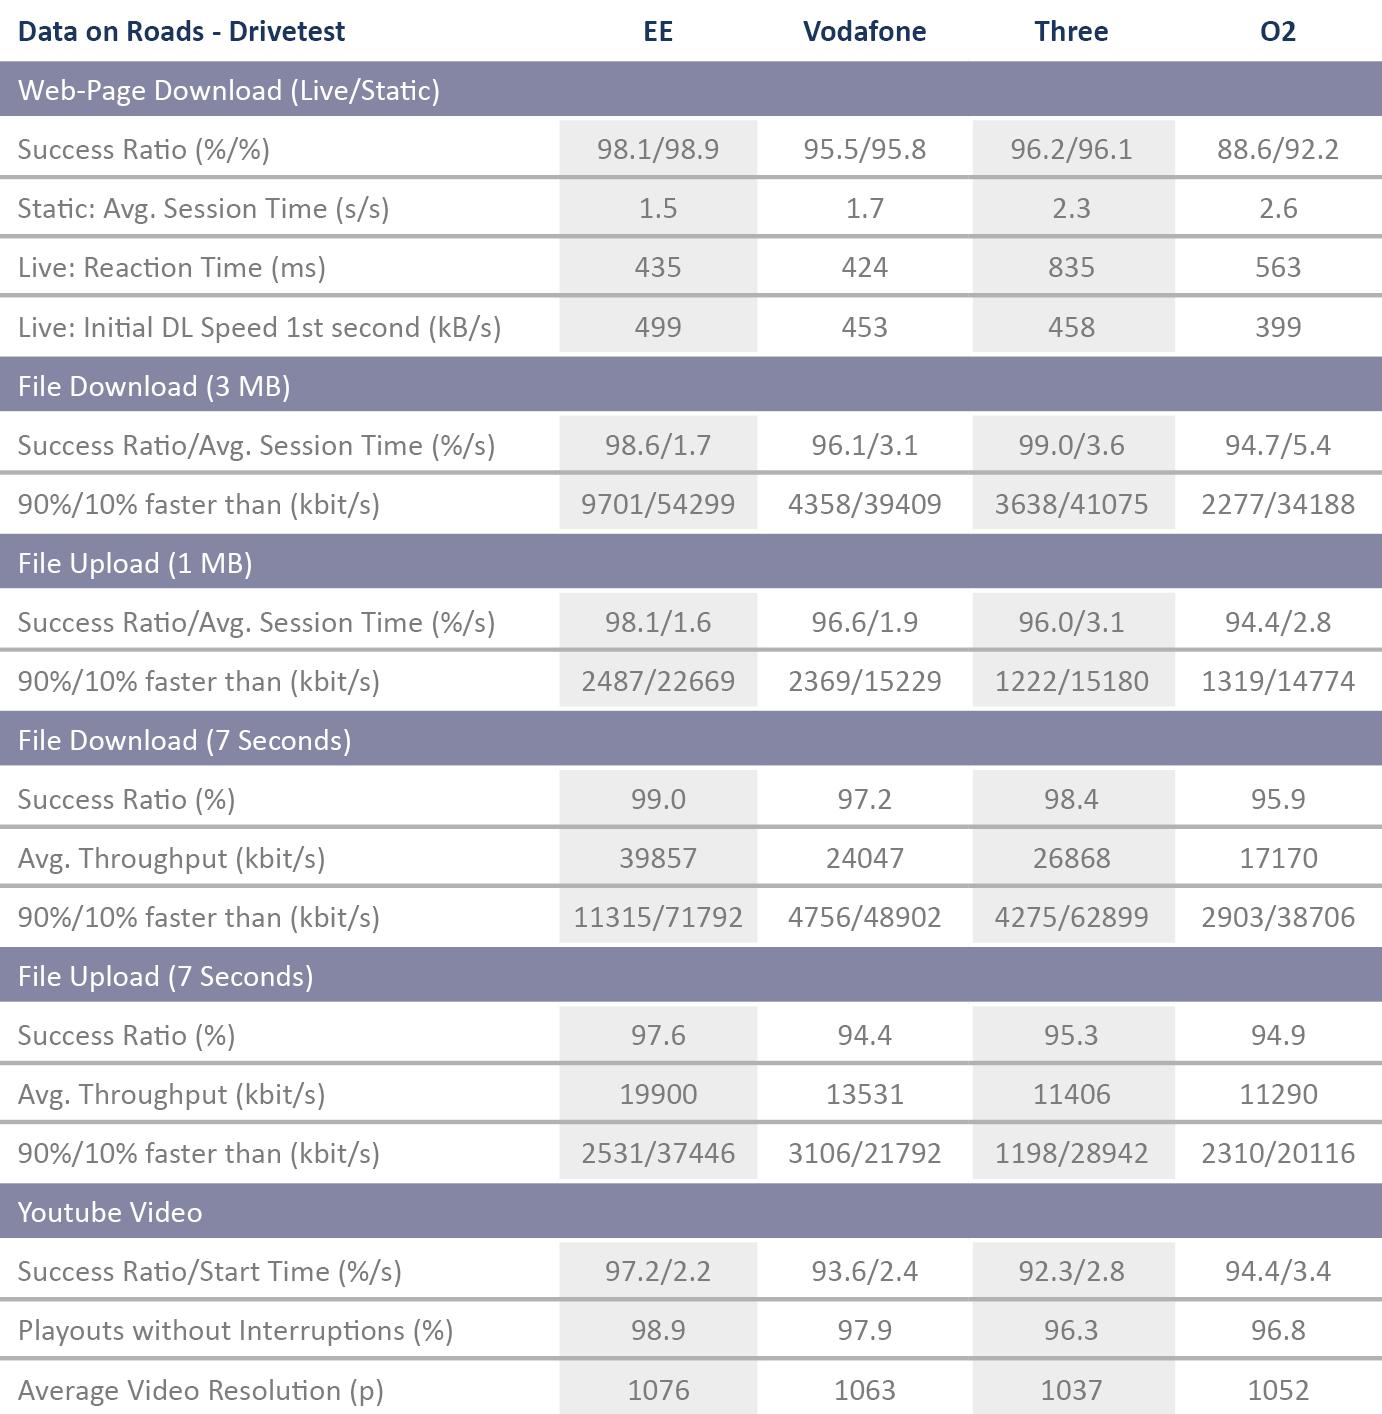 UK_Tabelle_DataRoads2017.png